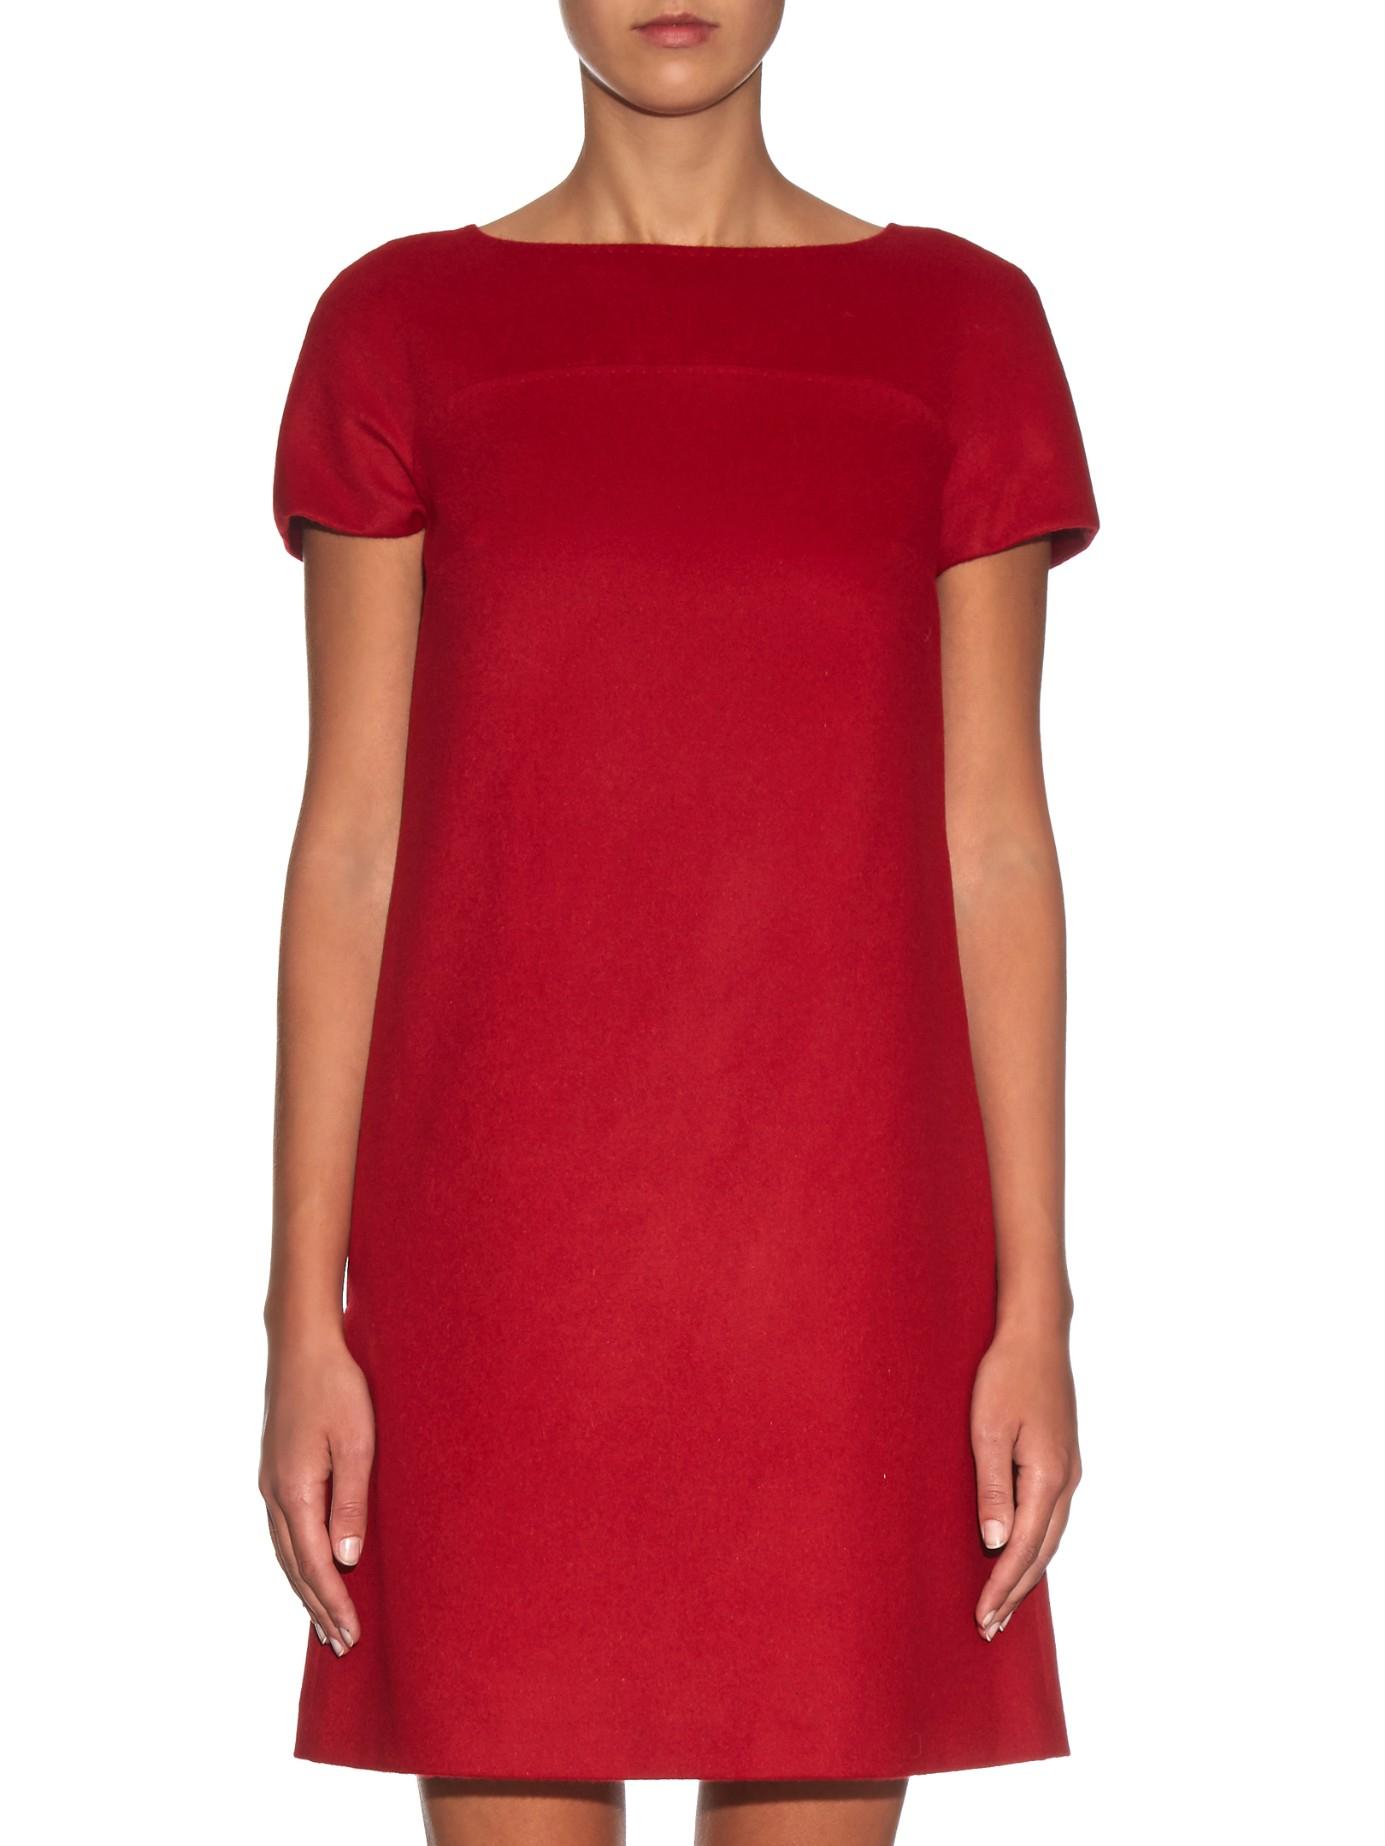 max mara studio elfo a line dress in red lyst. Black Bedroom Furniture Sets. Home Design Ideas